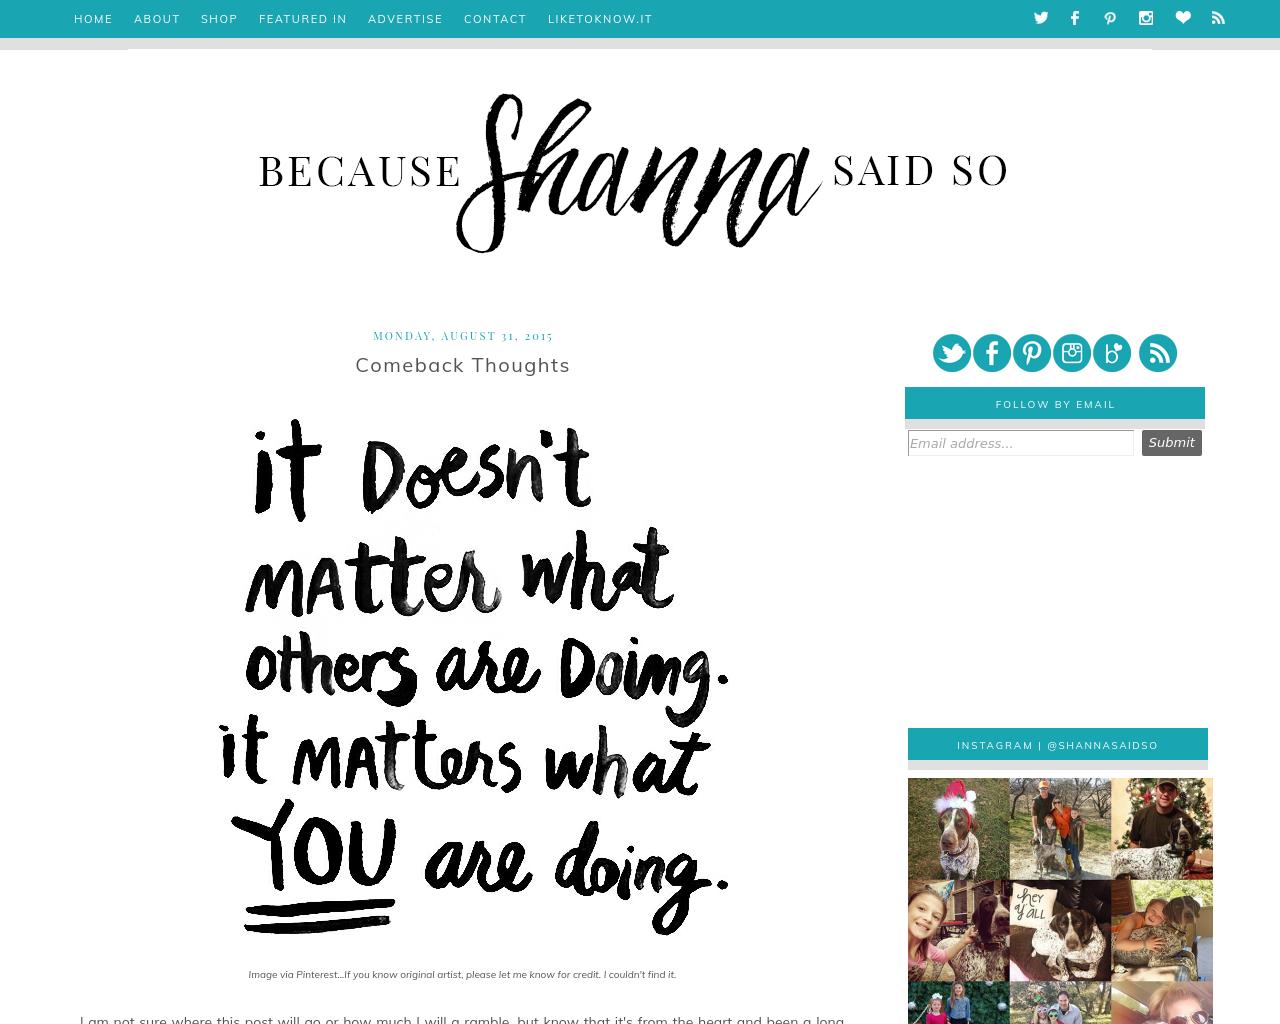 Because-Shanna-Said-So-Advertising-Reviews-Pricing